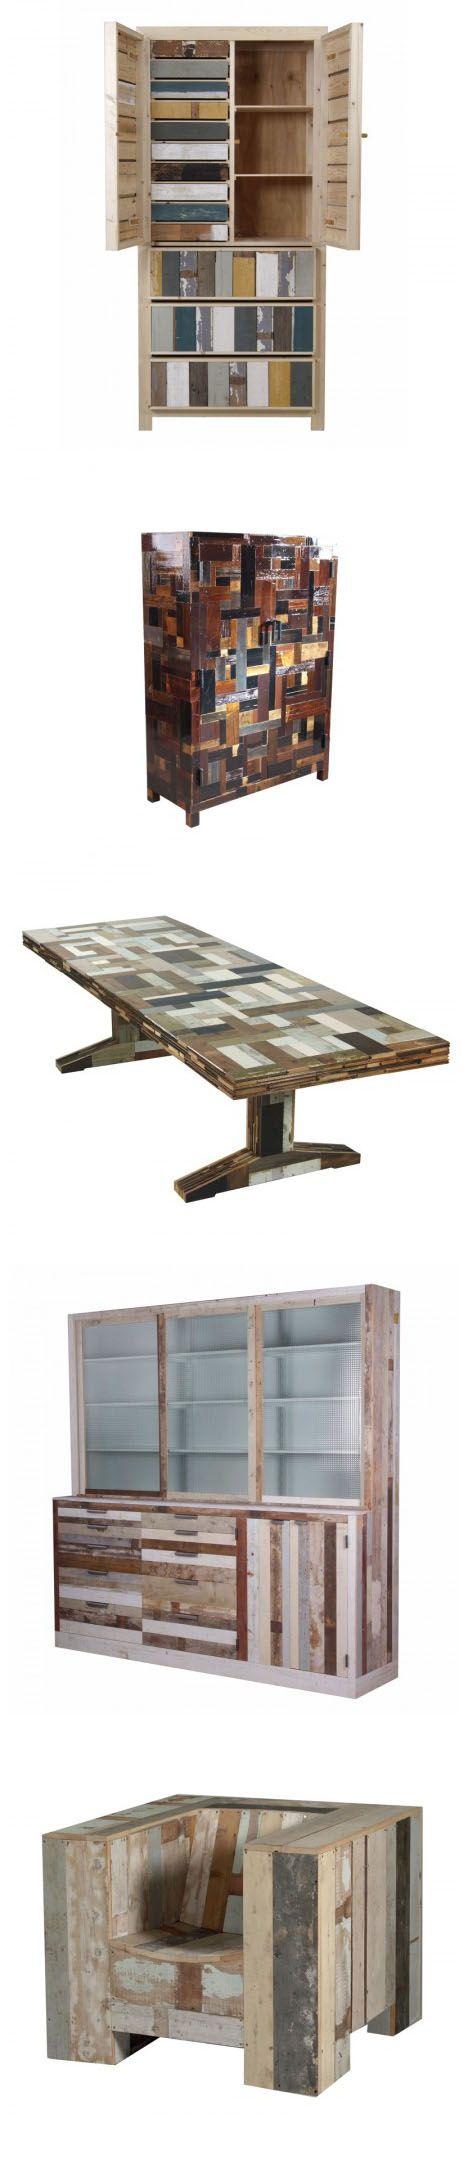 Piet Hein Eek's Raw Material for Furniture: Scrap Wood